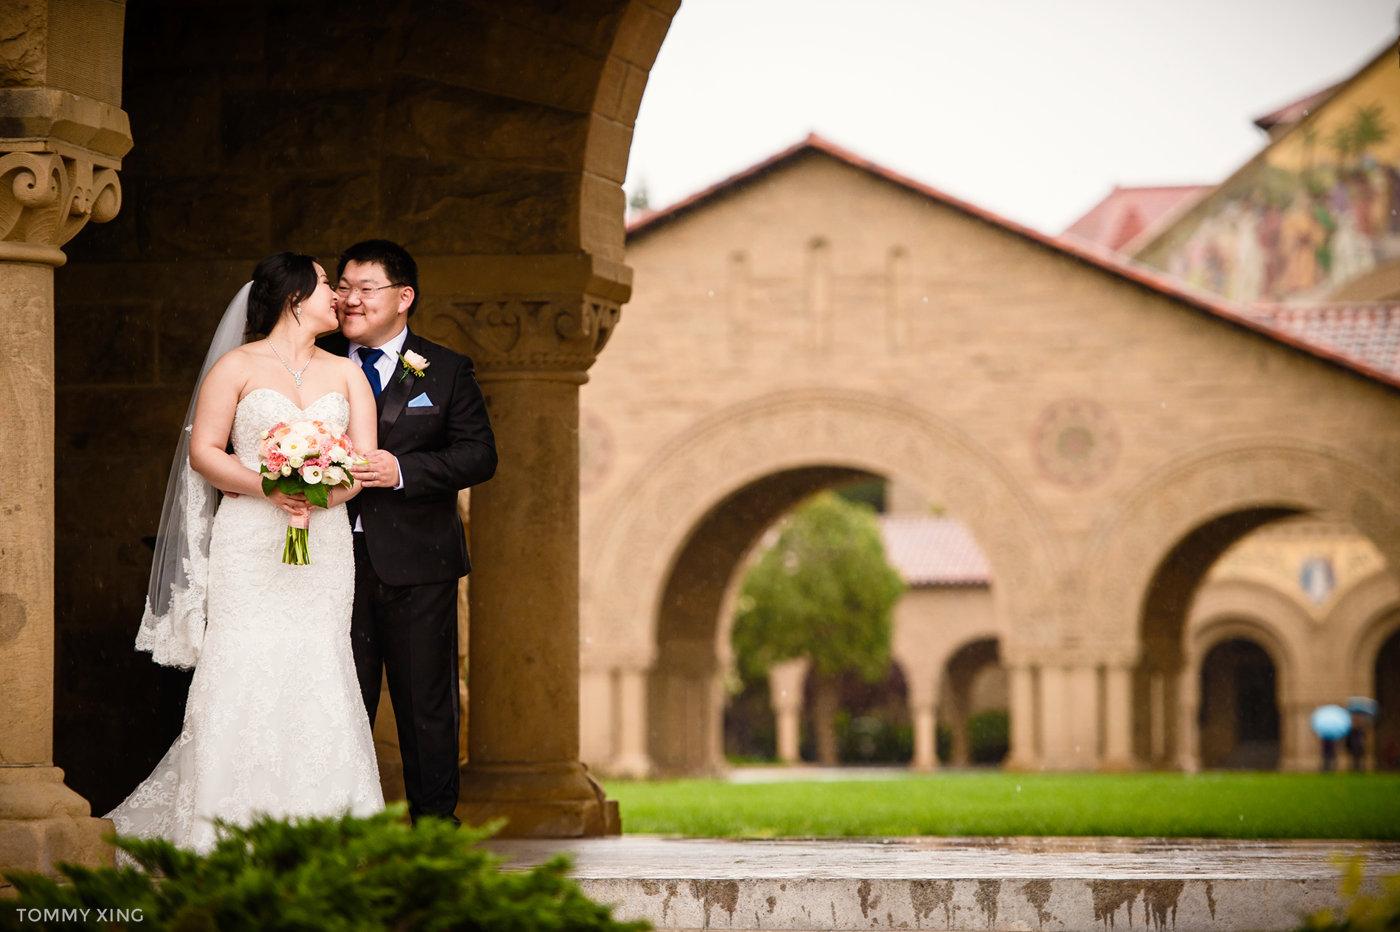 STANFORD MEMORIAL CHURCH WEDDING - Wenjie & Chengcheng - SAN FRANCISCO BAY AREA 斯坦福教堂婚礼跟拍 - 洛杉矶婚礼婚纱照摄影师 Tommy Xing Photography163.jpg